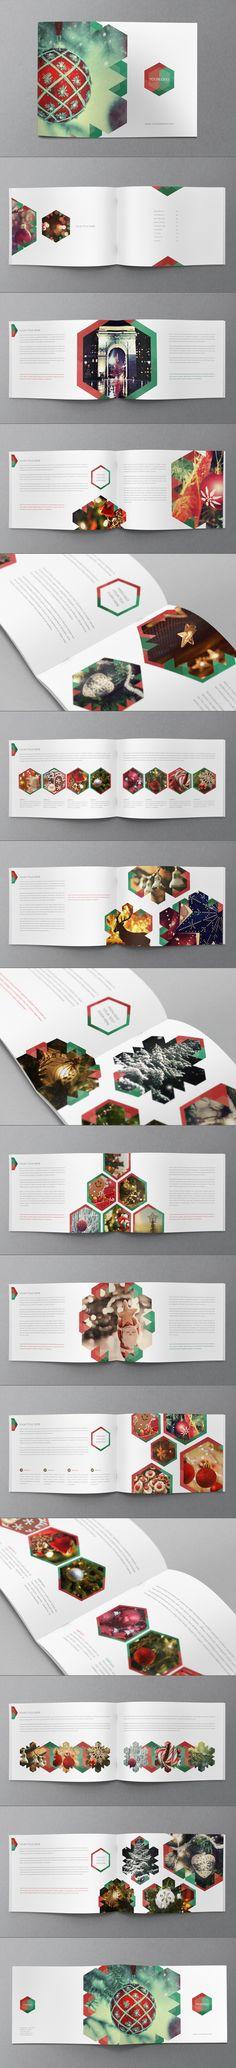 Brochure - shape as binding element